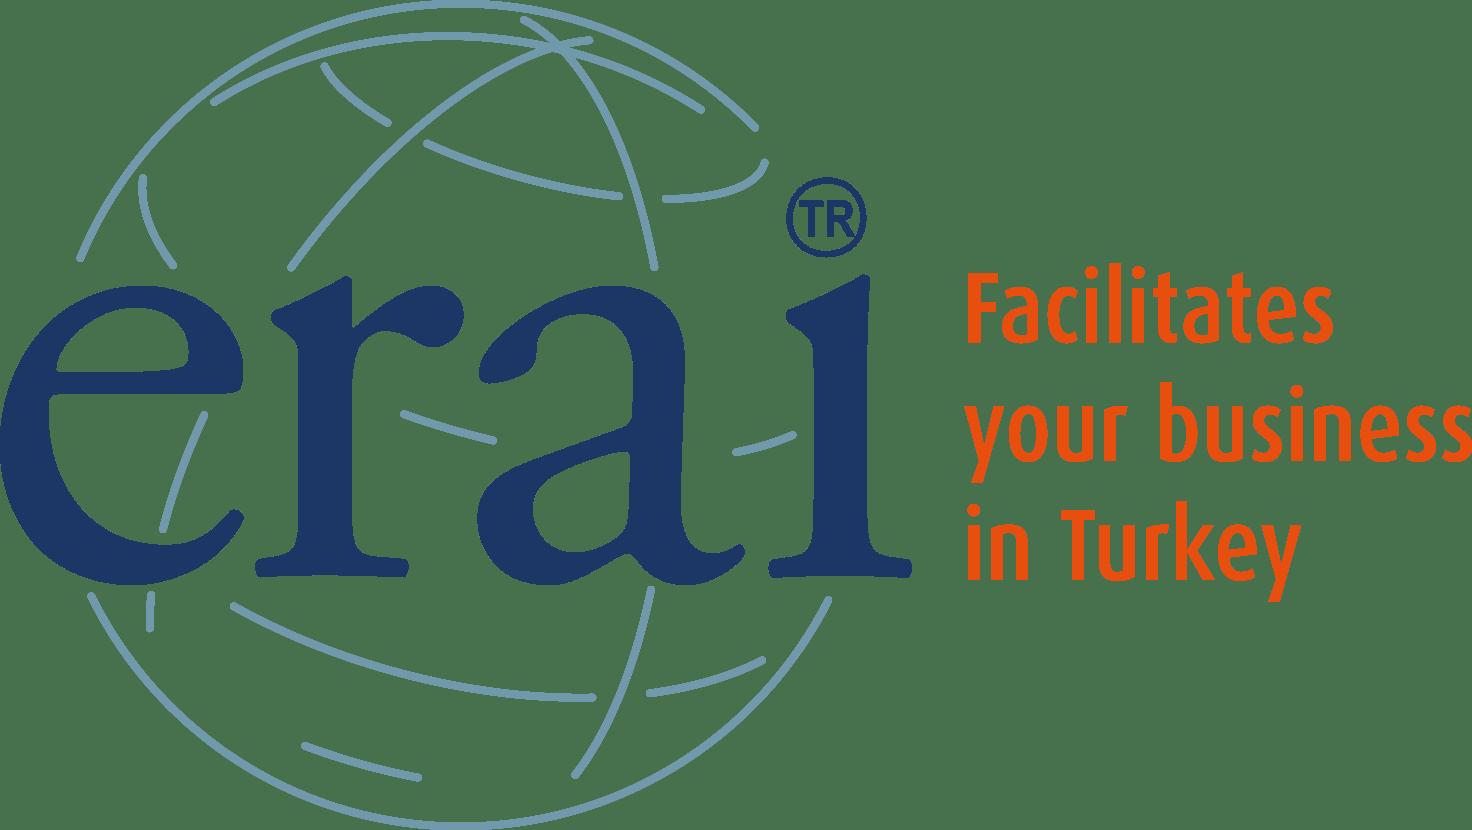 Erai Turkey, Business Development & Management